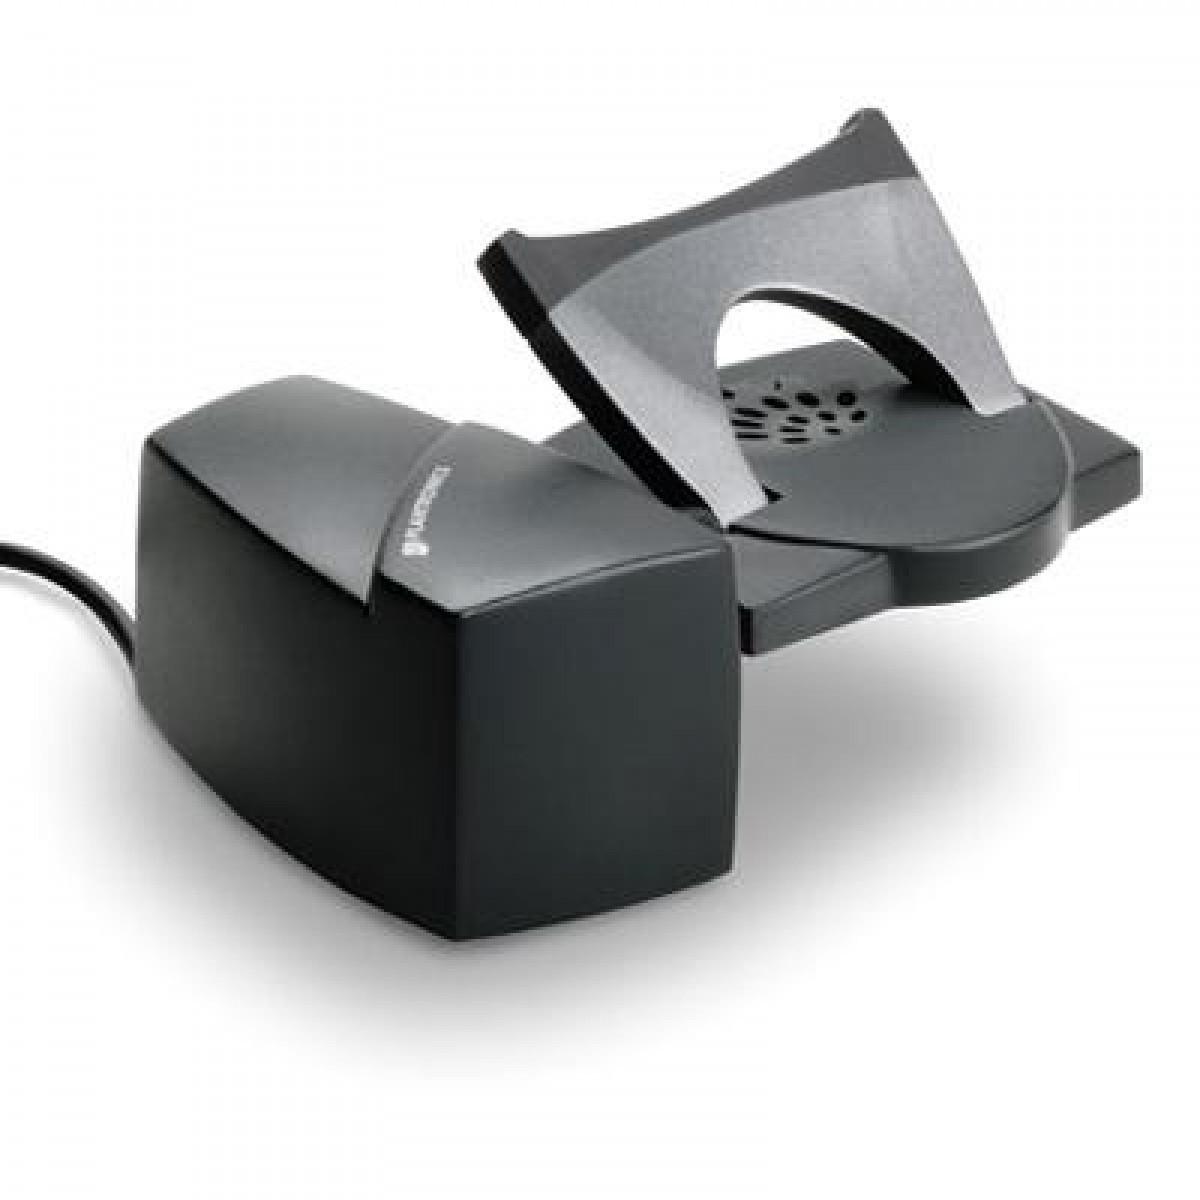 plantronics cs55 wireless headset manual